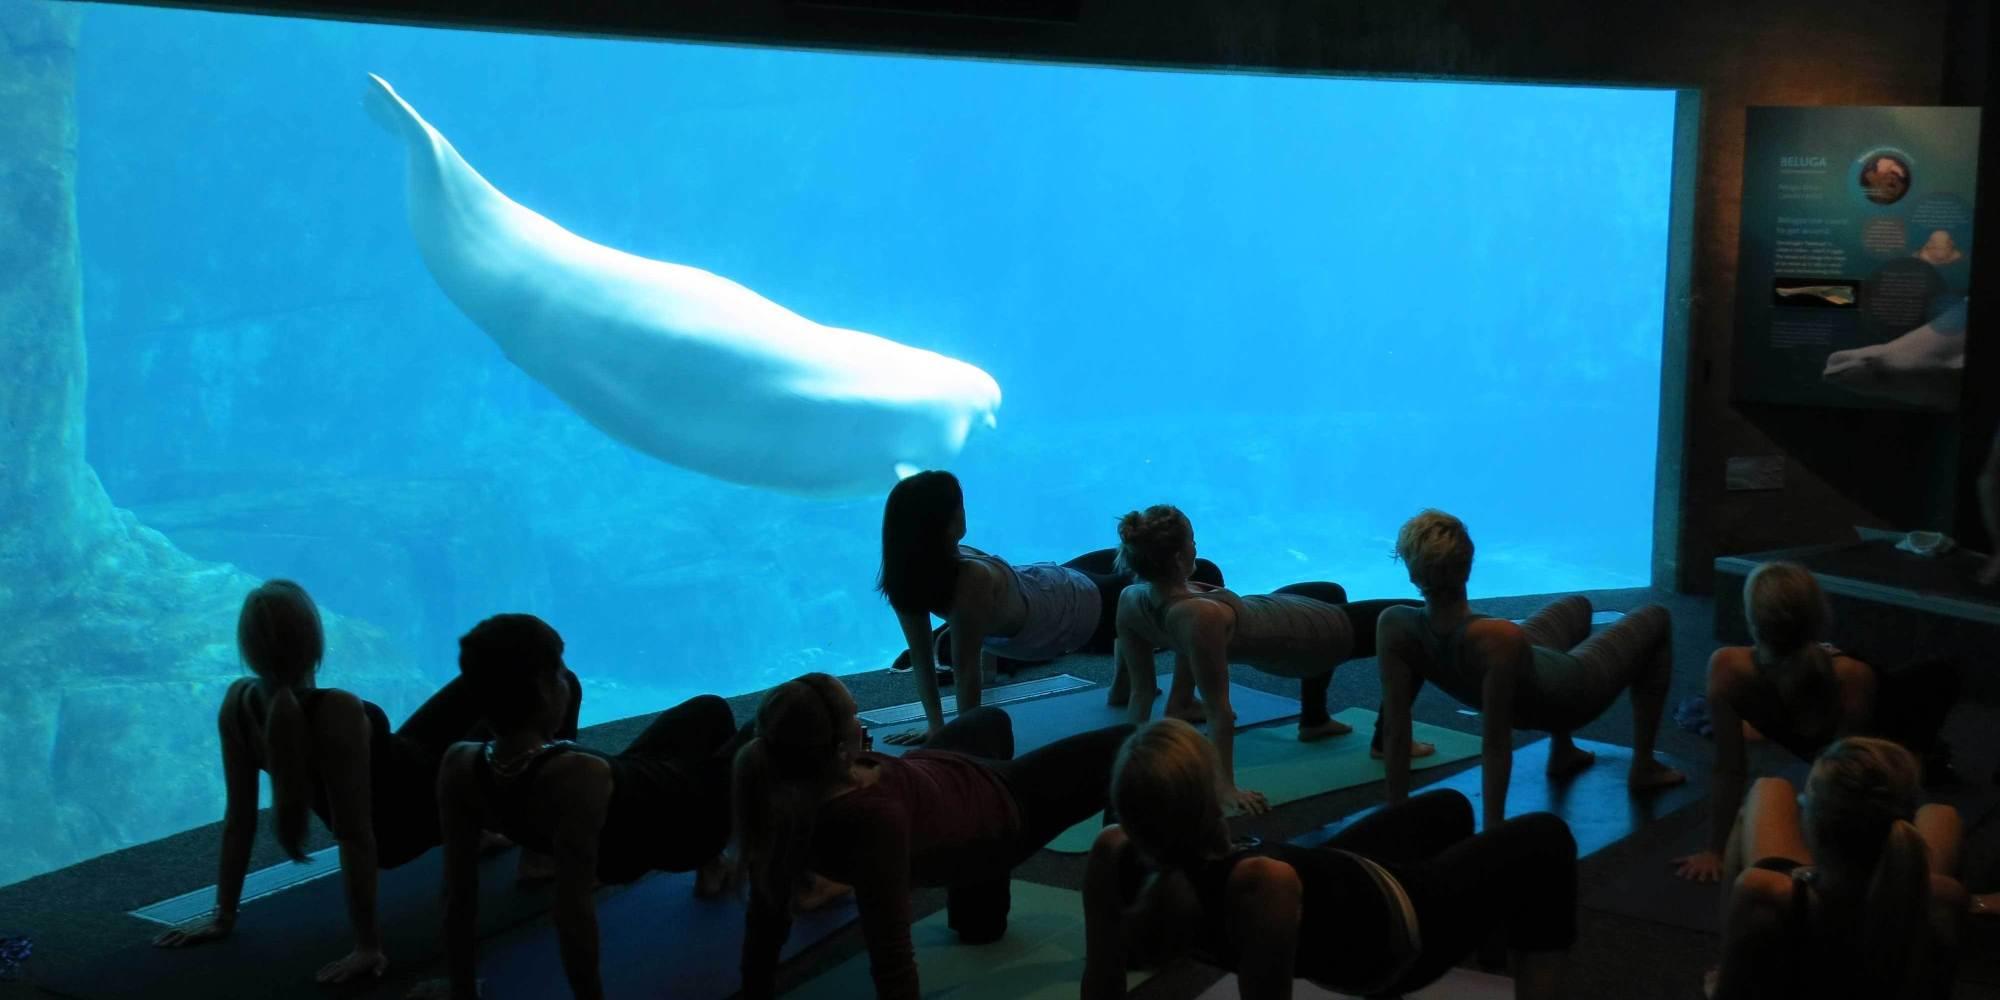 Fish aquarium vancouver - Fish Aquarium Vancouver